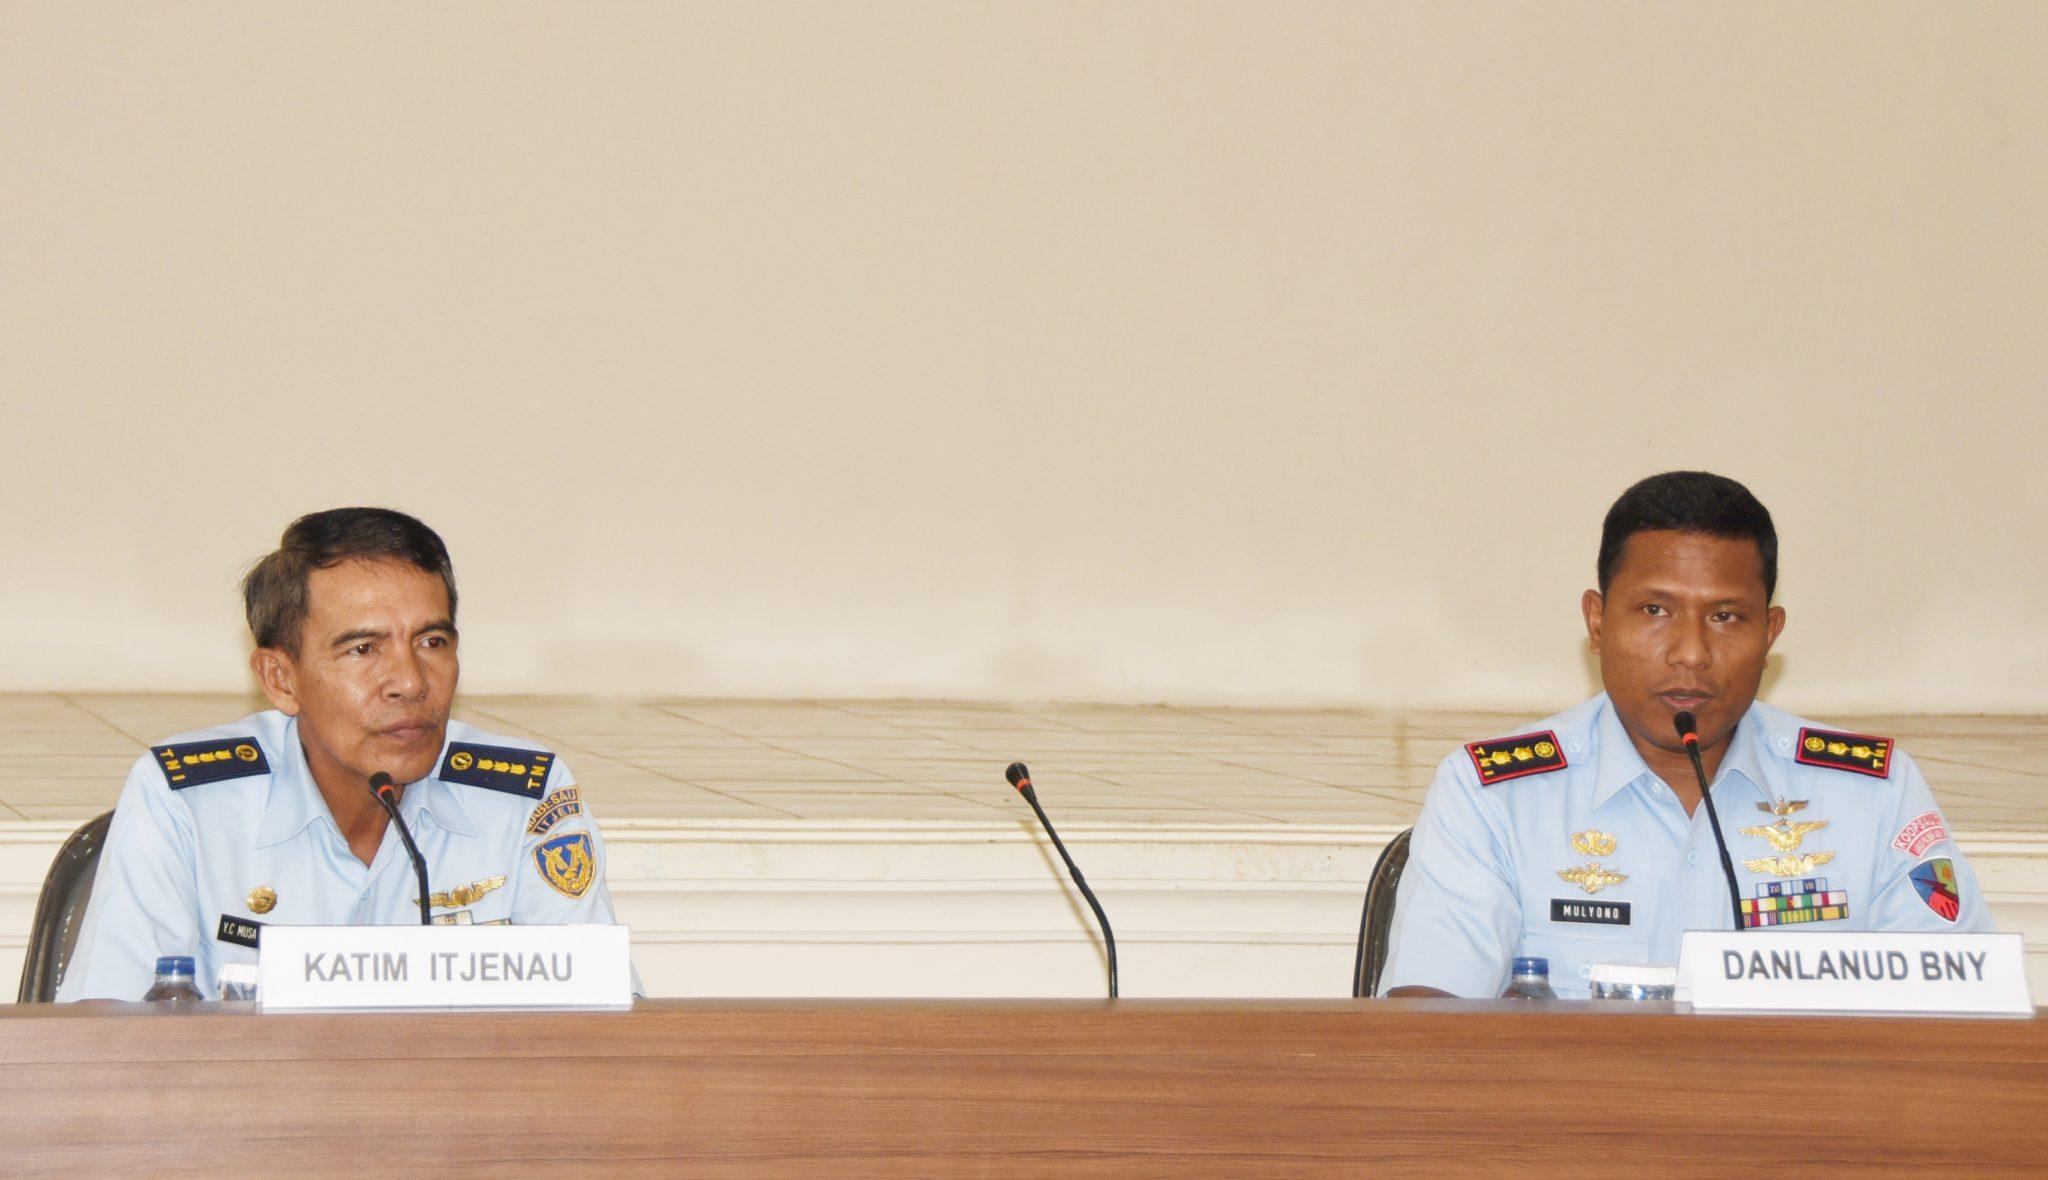 Exit Briefing Wasrikkap Itjenau di Lanud Pangeran M. Bun Yamin